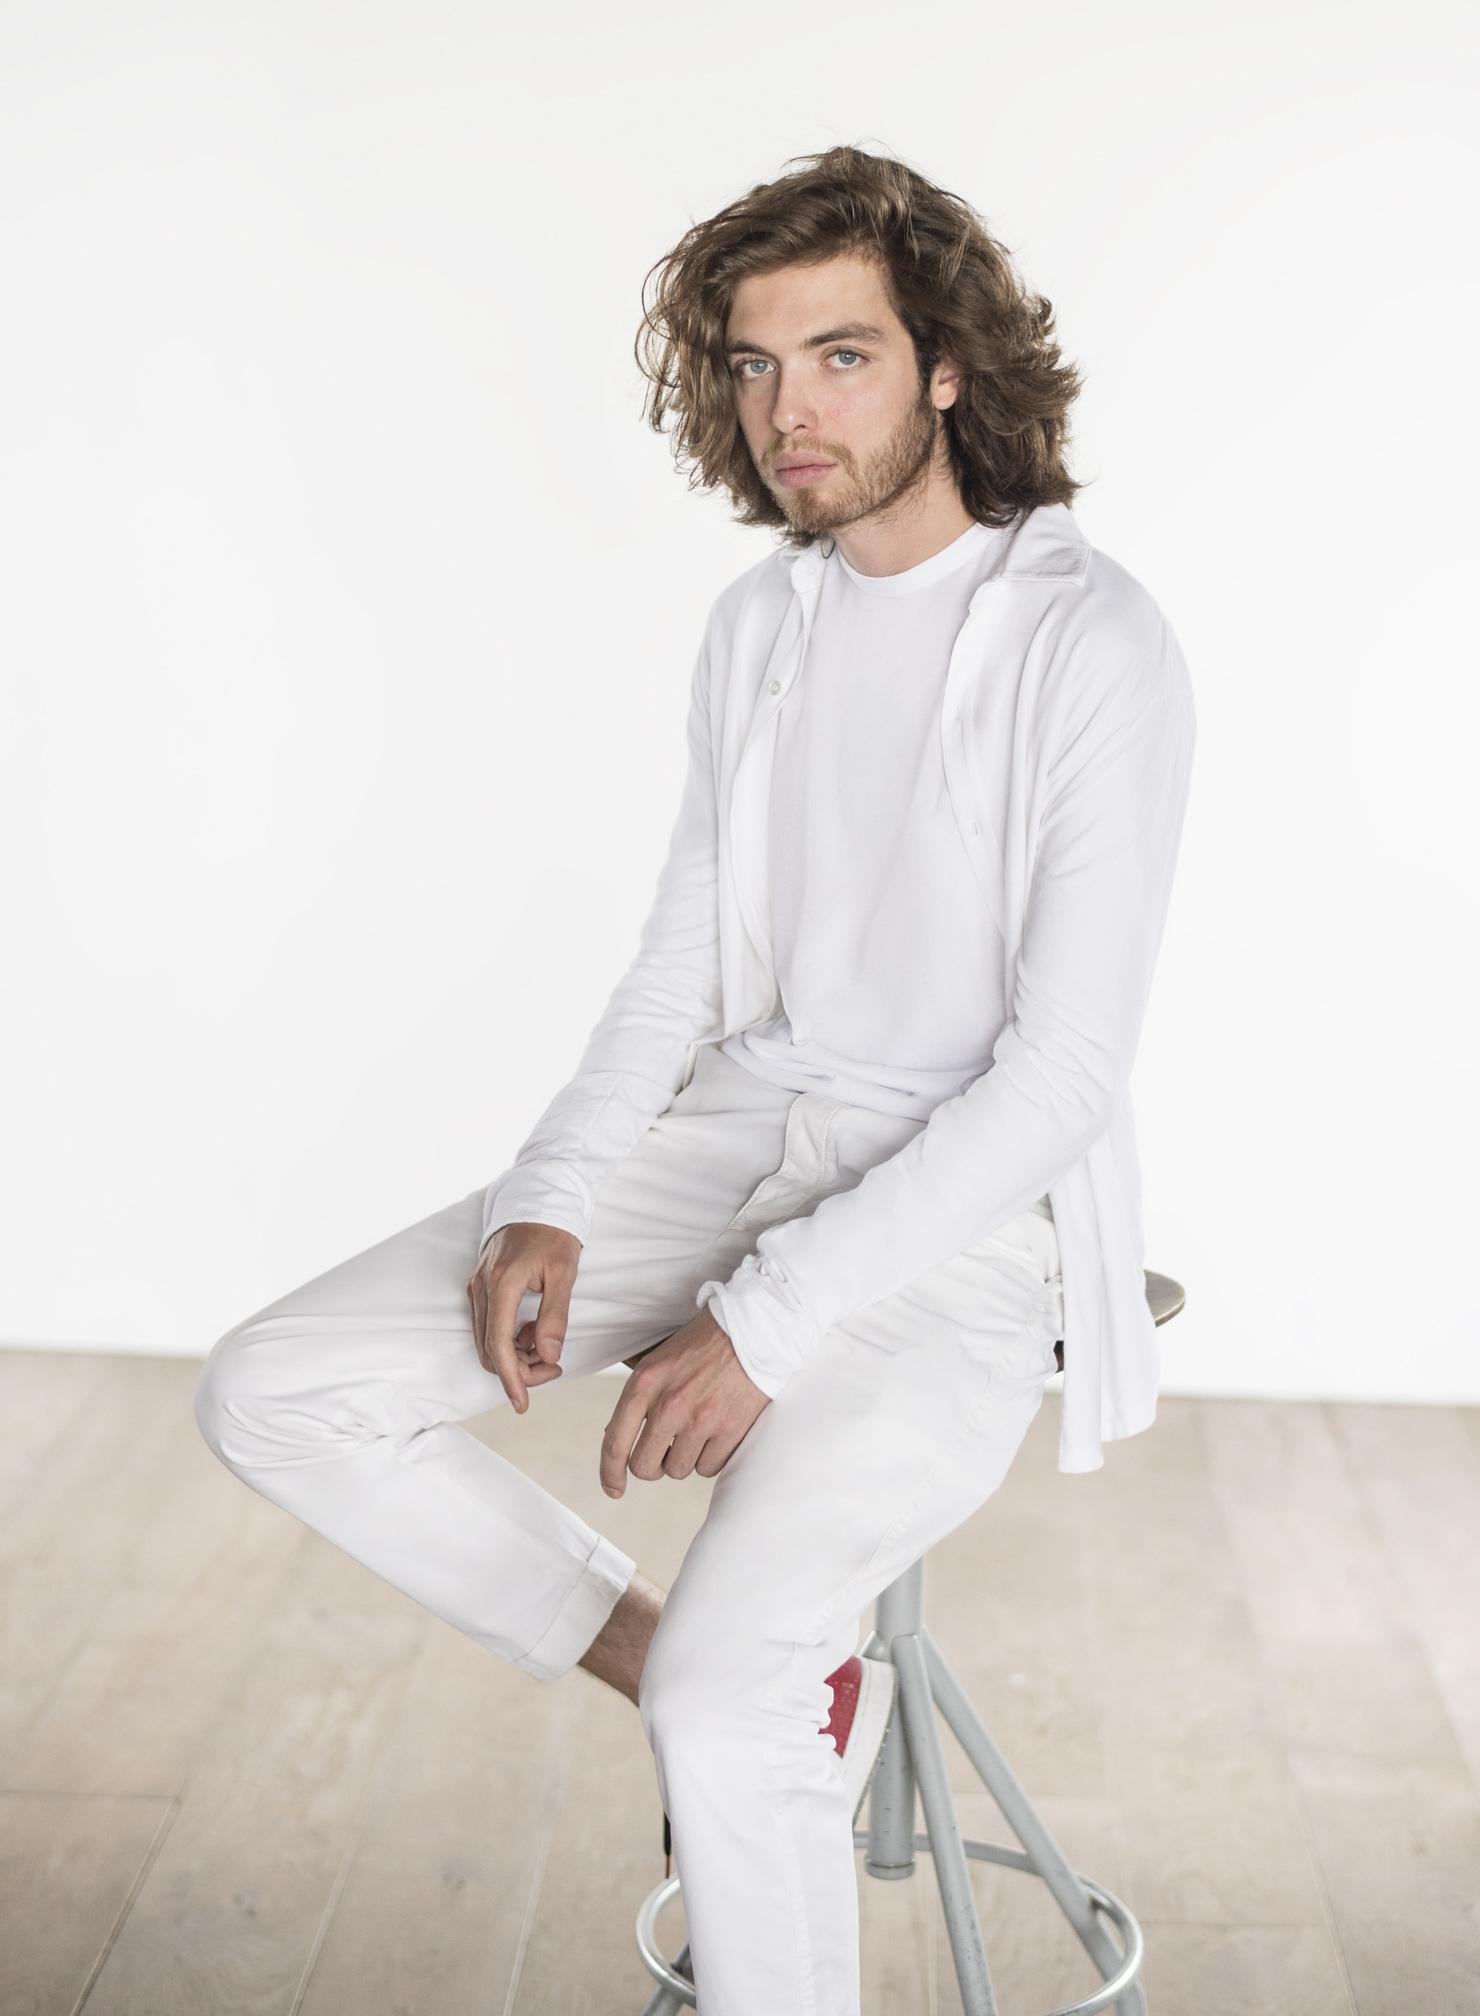 Lookbook Man S20 - The Essential Shirt